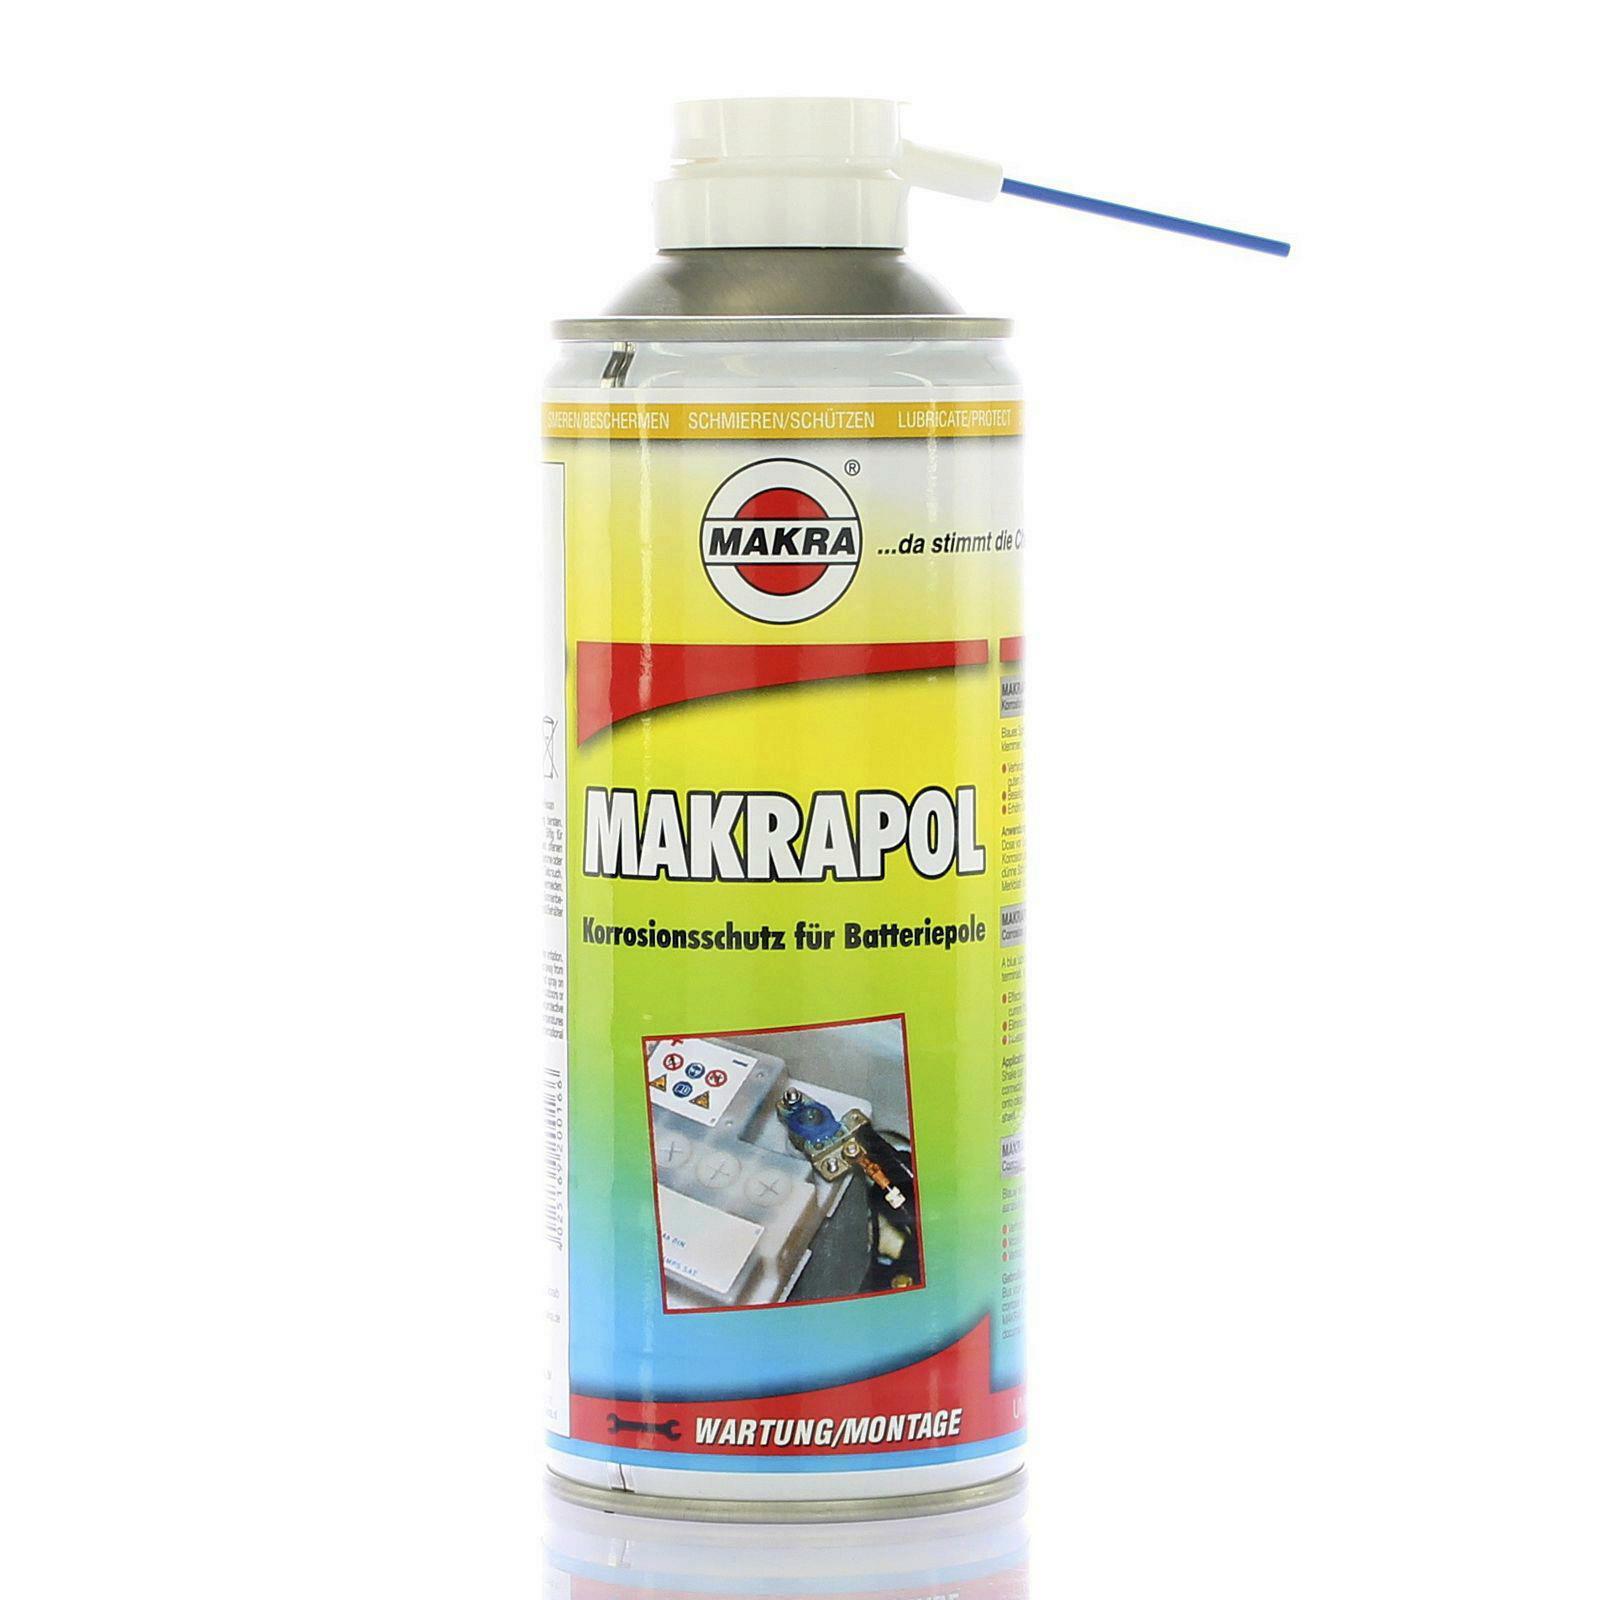 MAKRAPOL 400ml Polfett Batteriepolfett blau